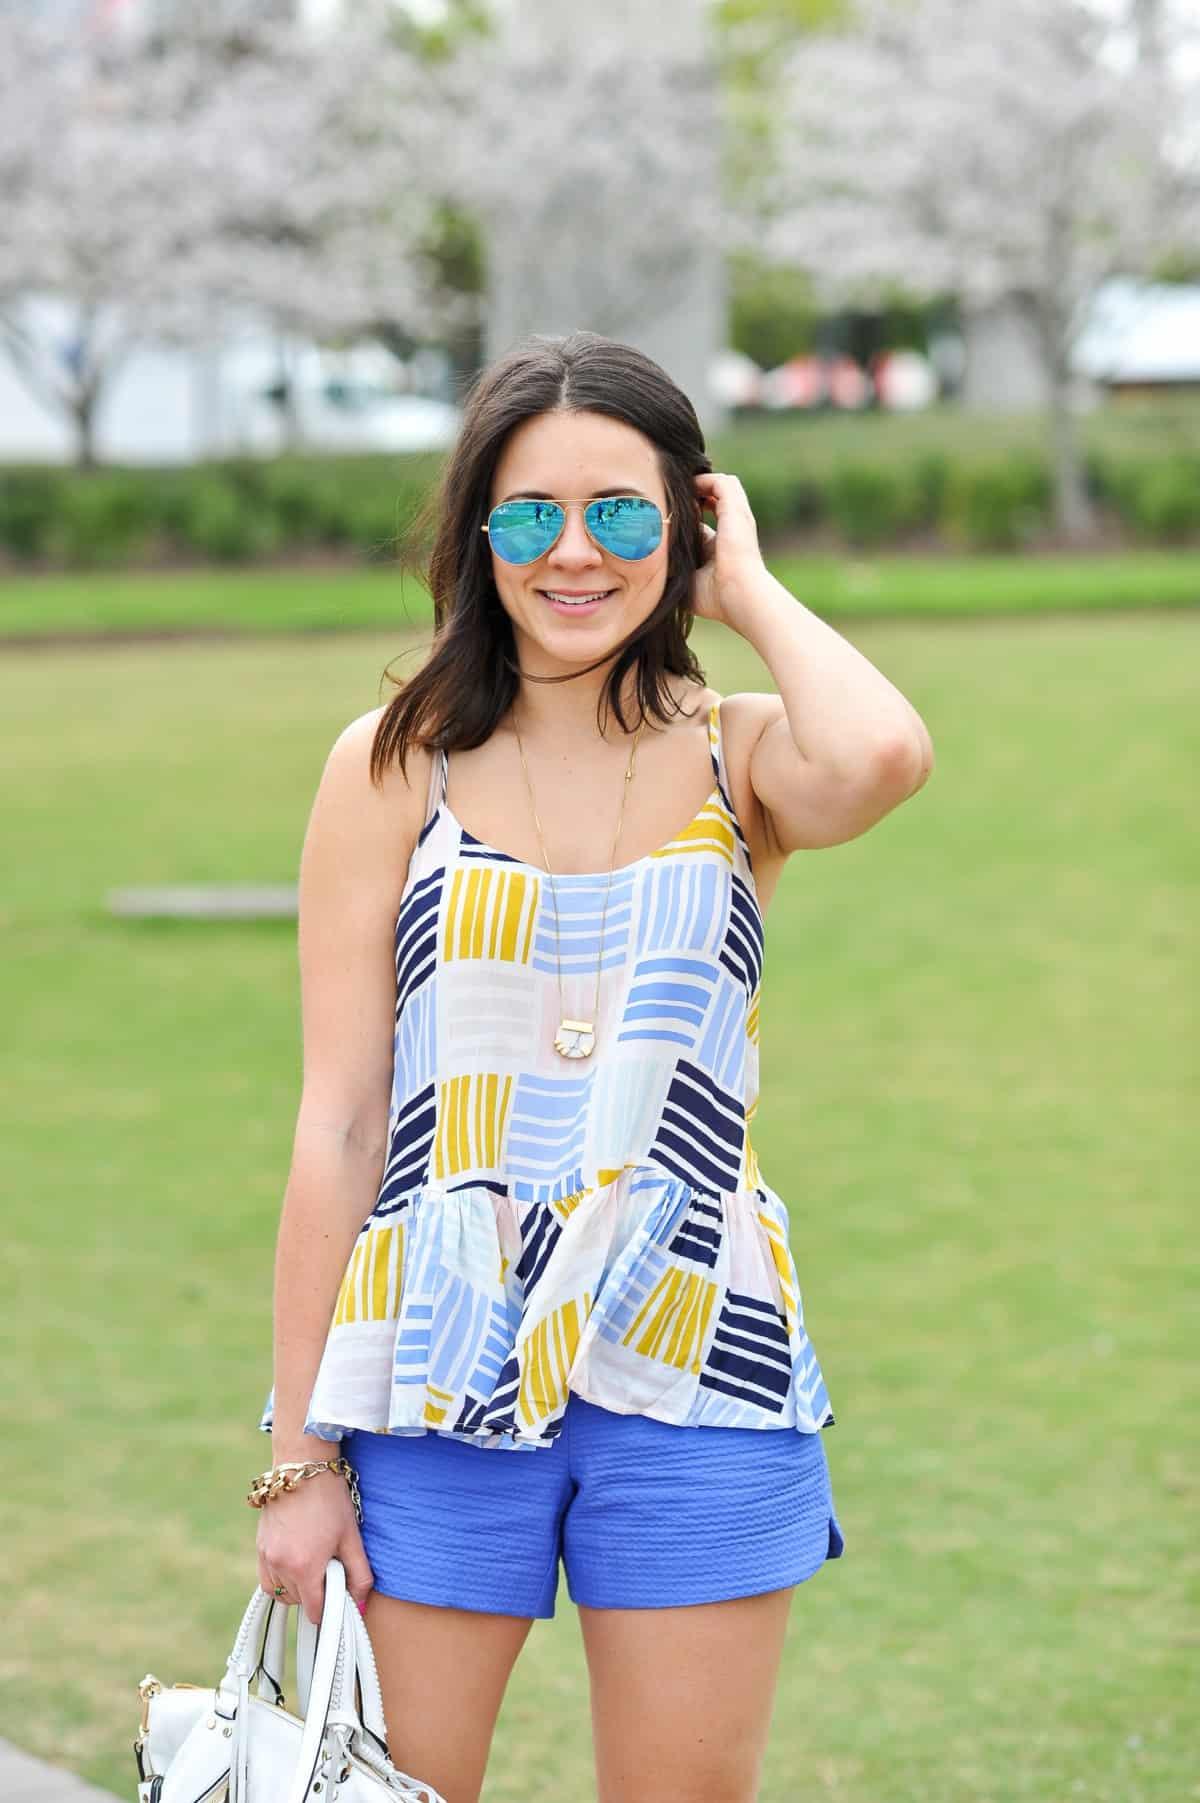 Old Navy printed peplum tank - summer outfit ideas - My Style Vita - @mystylevita - 13